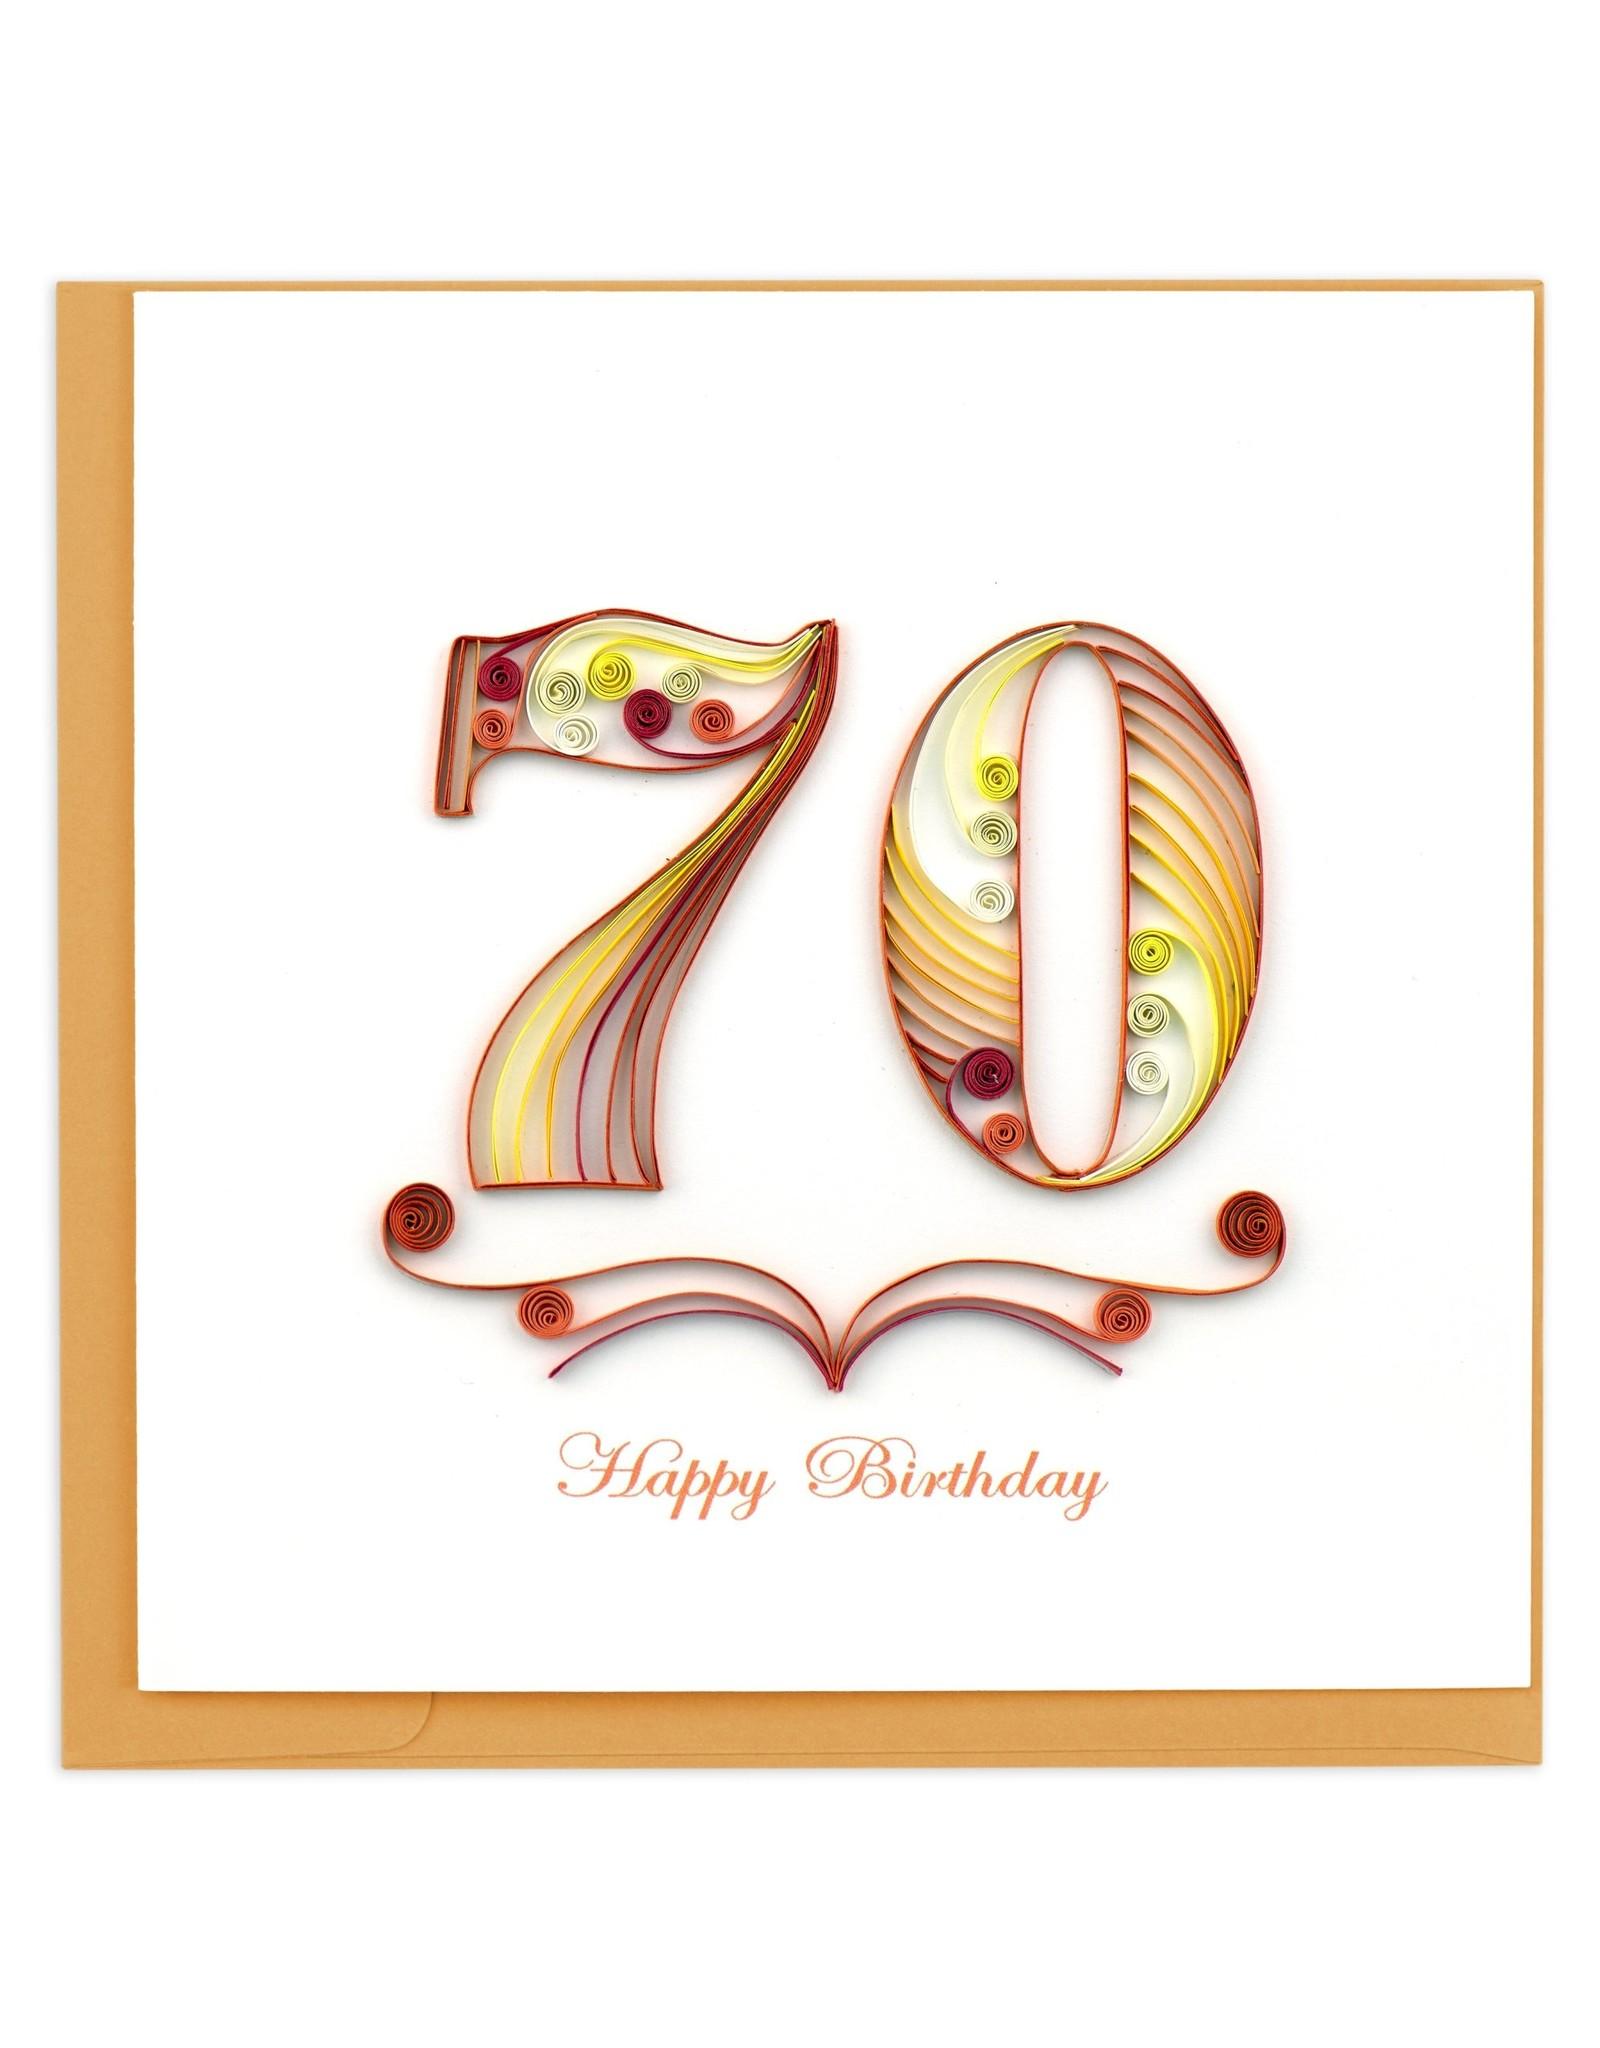 70th Birthday Quill